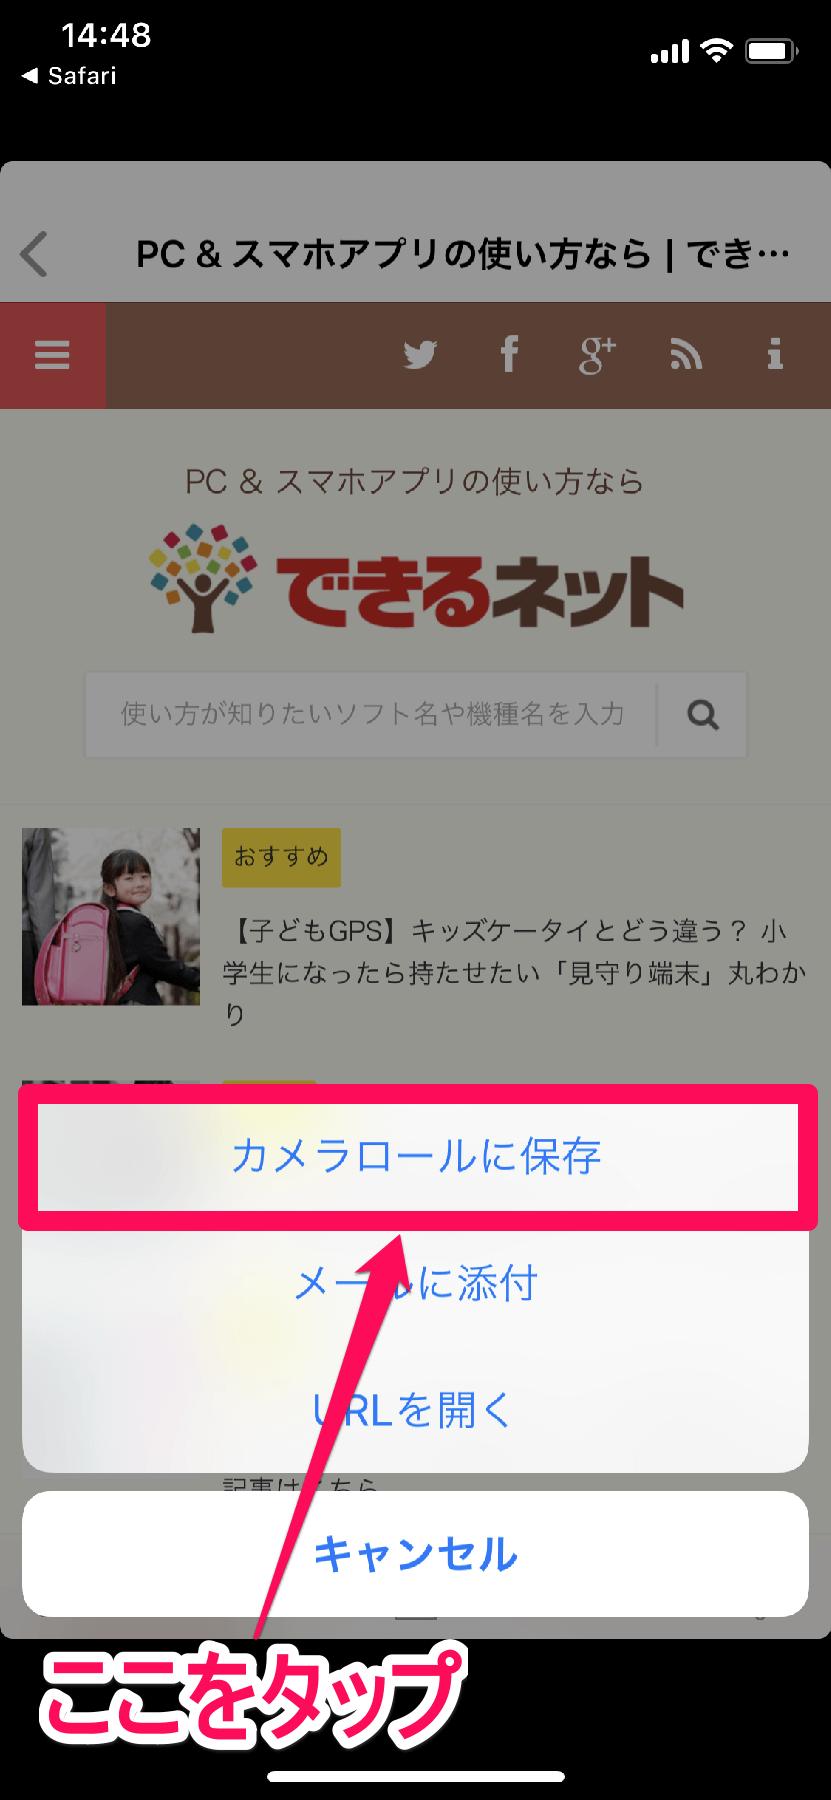 iPhone(アイフォーン)の「画面メモSS」アプリで撮影したスクリーンショットの共有先を選択する画面